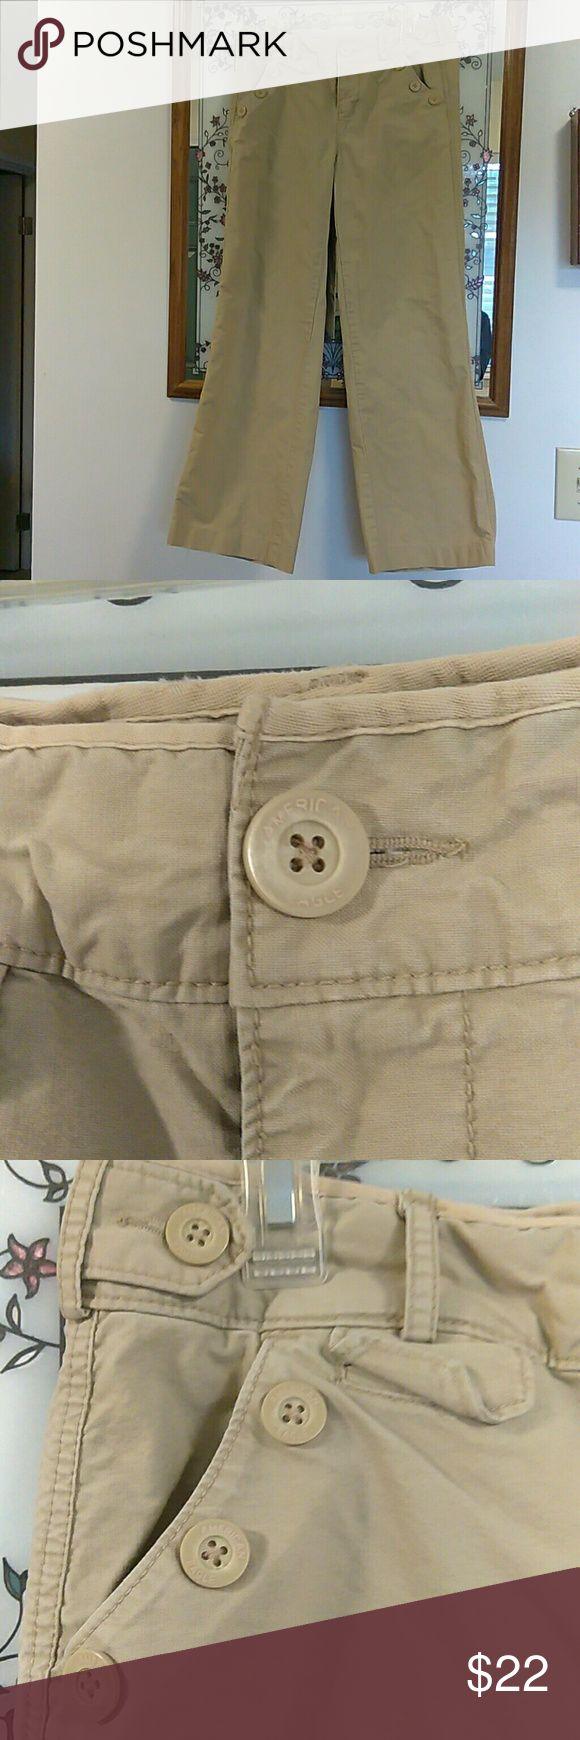 Selling this American Eagle khaki trousers on Poshmark! My username is: lovingmom3176. #shopmycloset #poshmark #fashion #shopping #style #forsale #American Eagle Outfitters #Pants